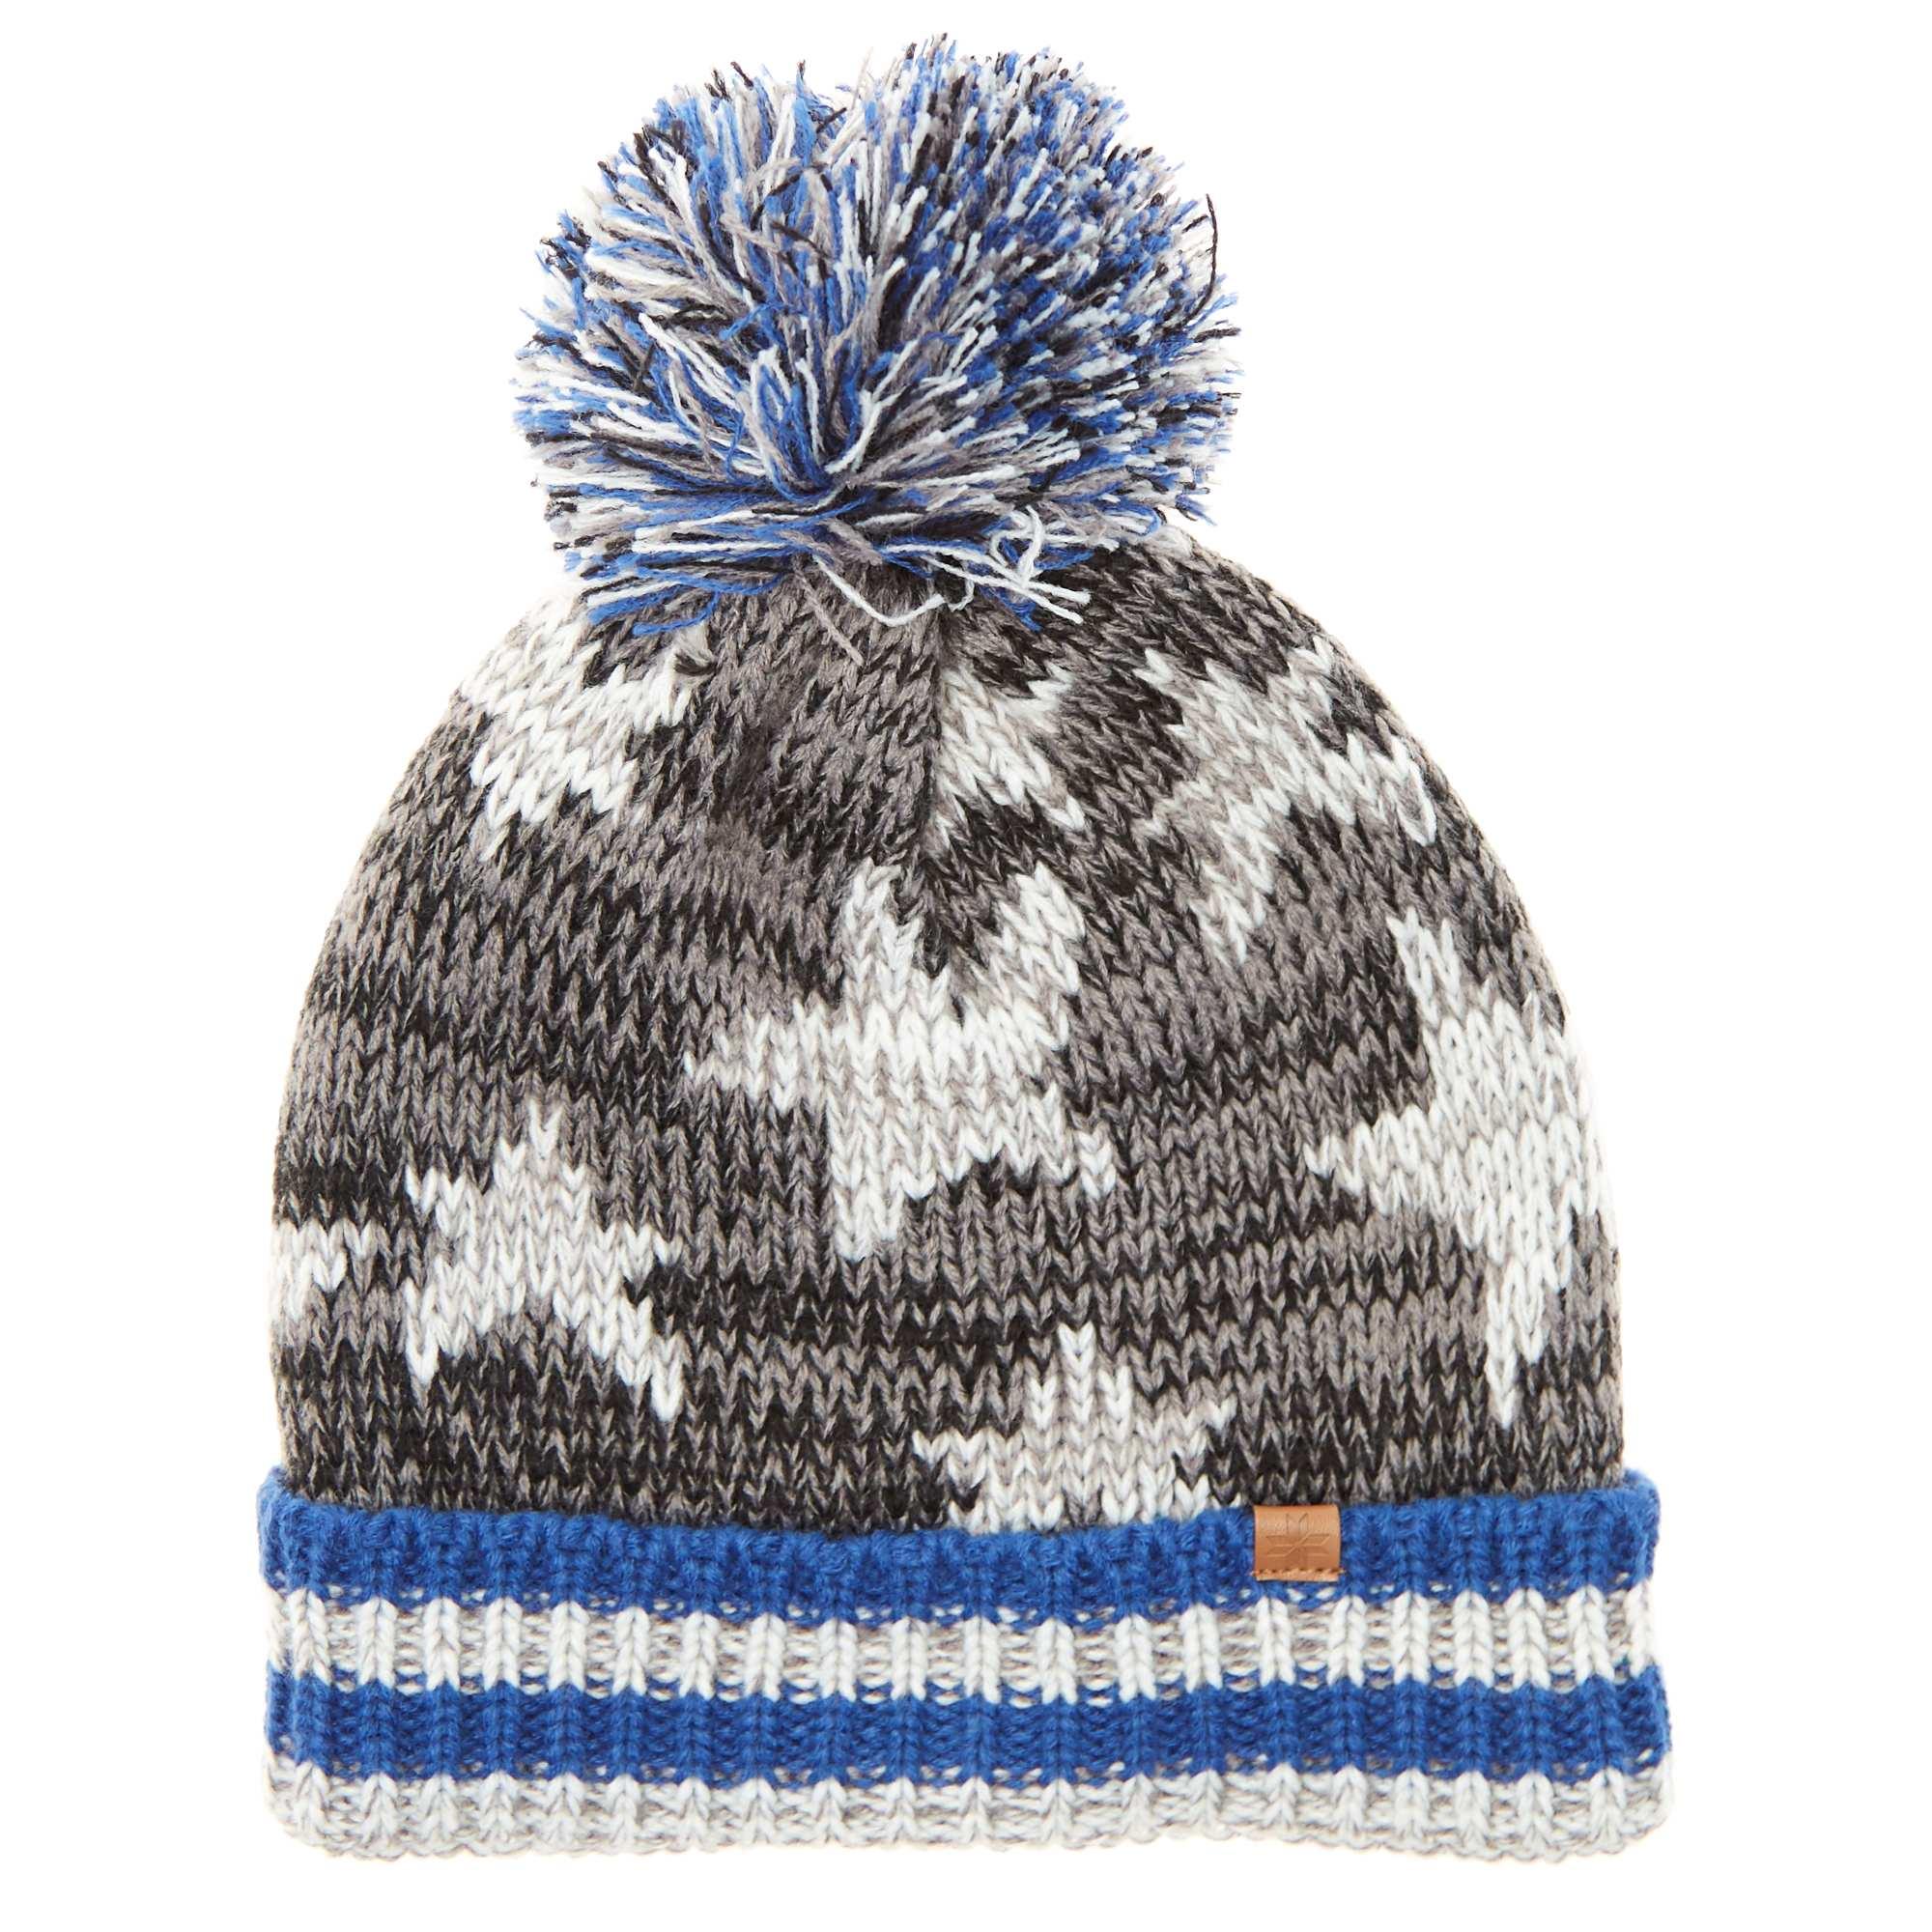 Bonnet à pompon Garçon - noir bleu - Kiabi - 6,00€ 44fd3a56c43